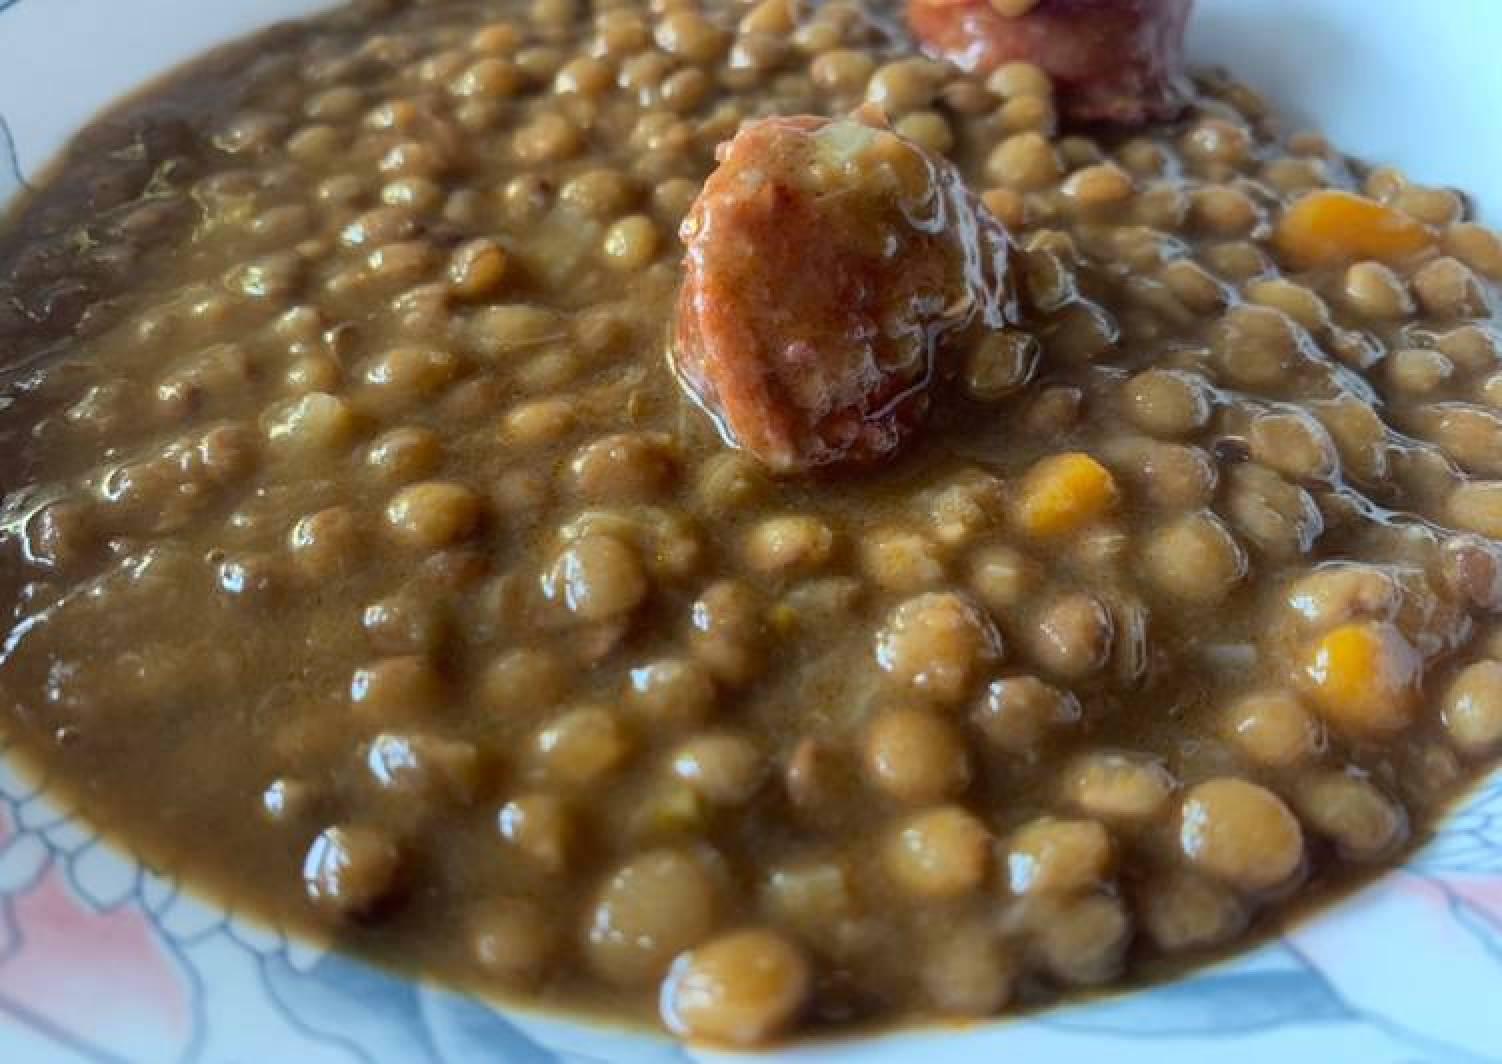 Lentils with chorizo